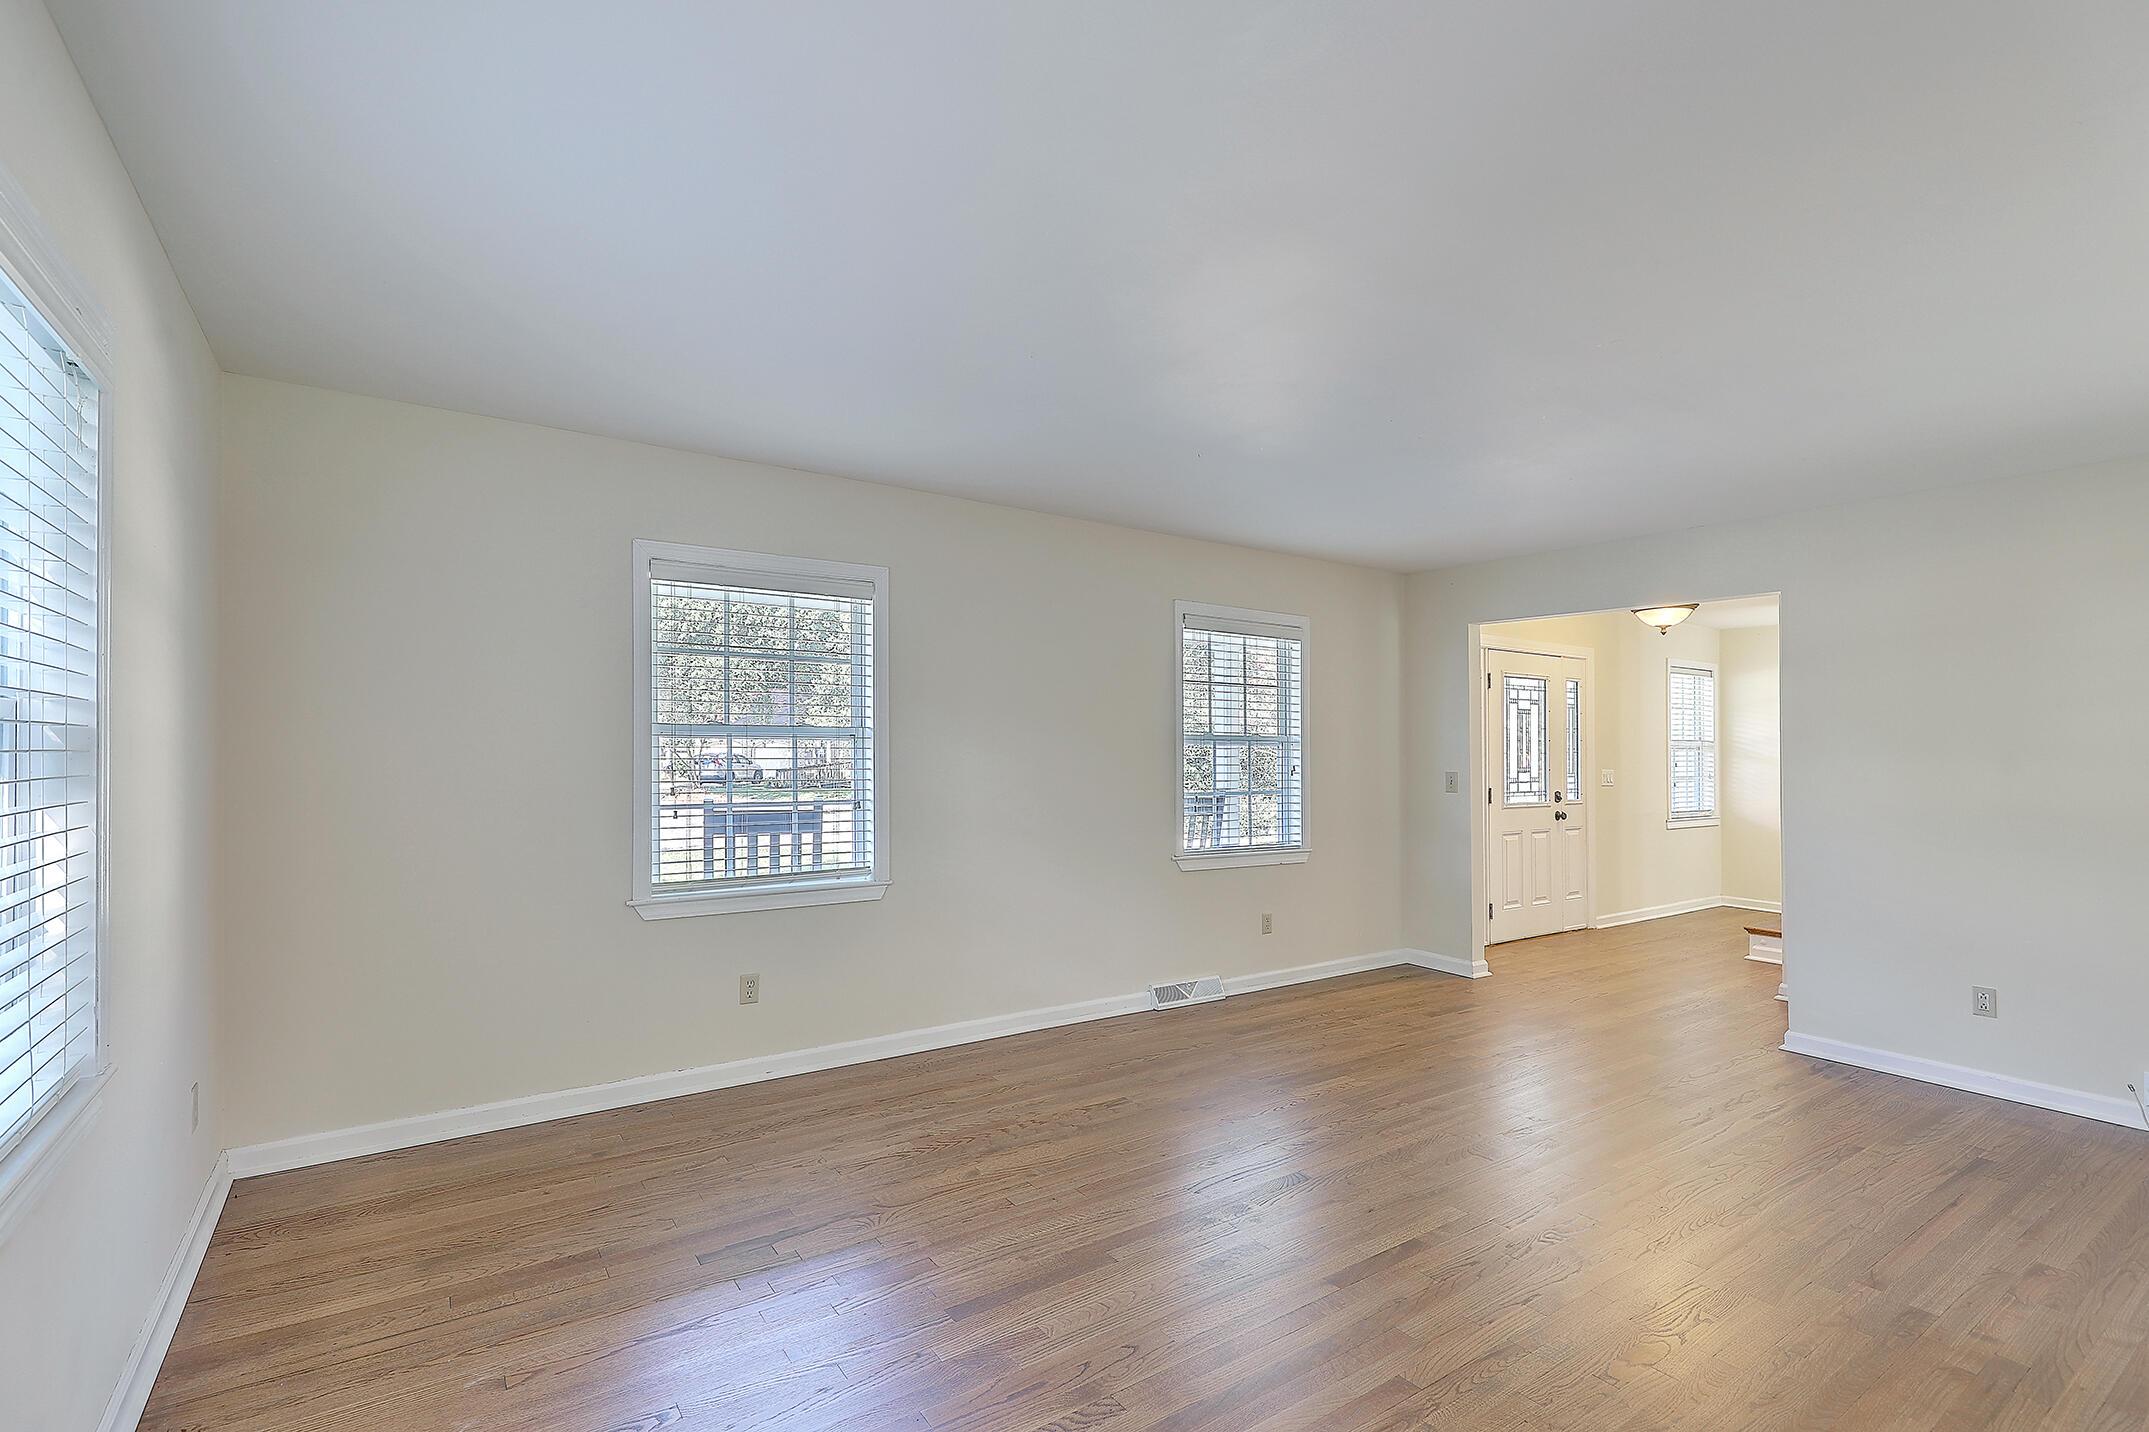 Cooper Estates Homes For Sale - 901 Searle, Mount Pleasant, SC - 1